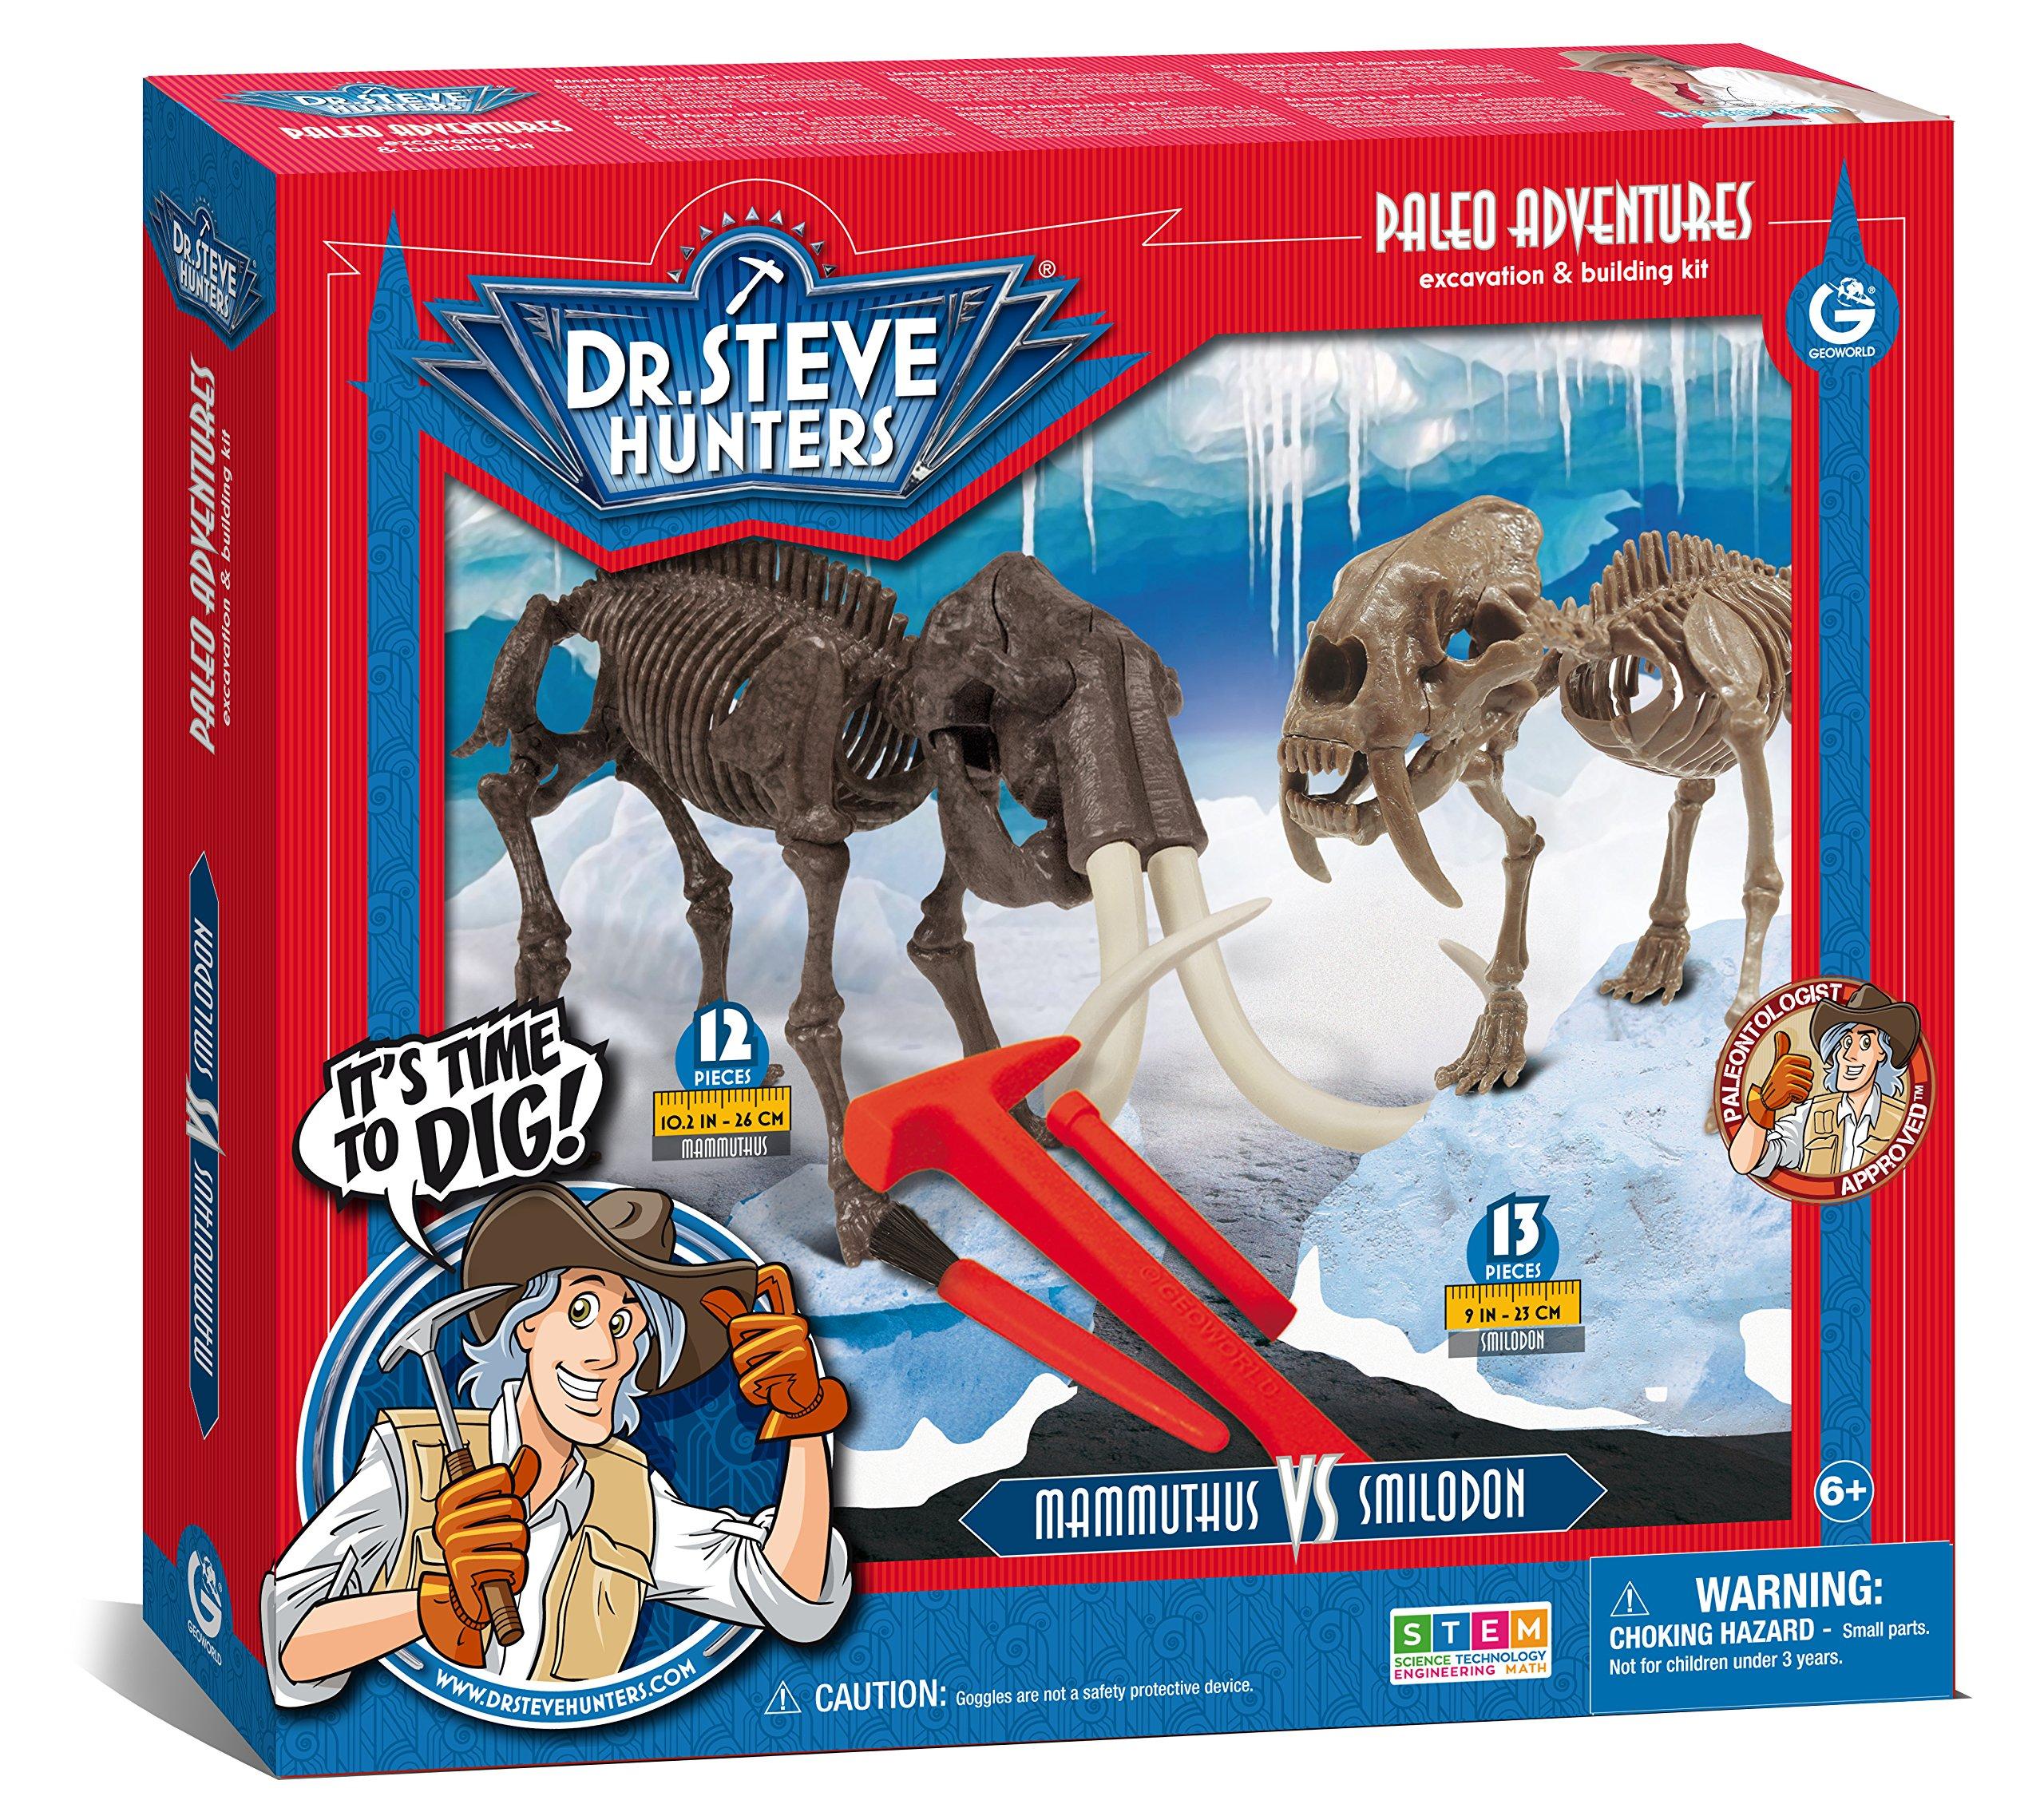 Geoworld Paleo Adventures Smilodon vs. Mammuthus Excavation Kit